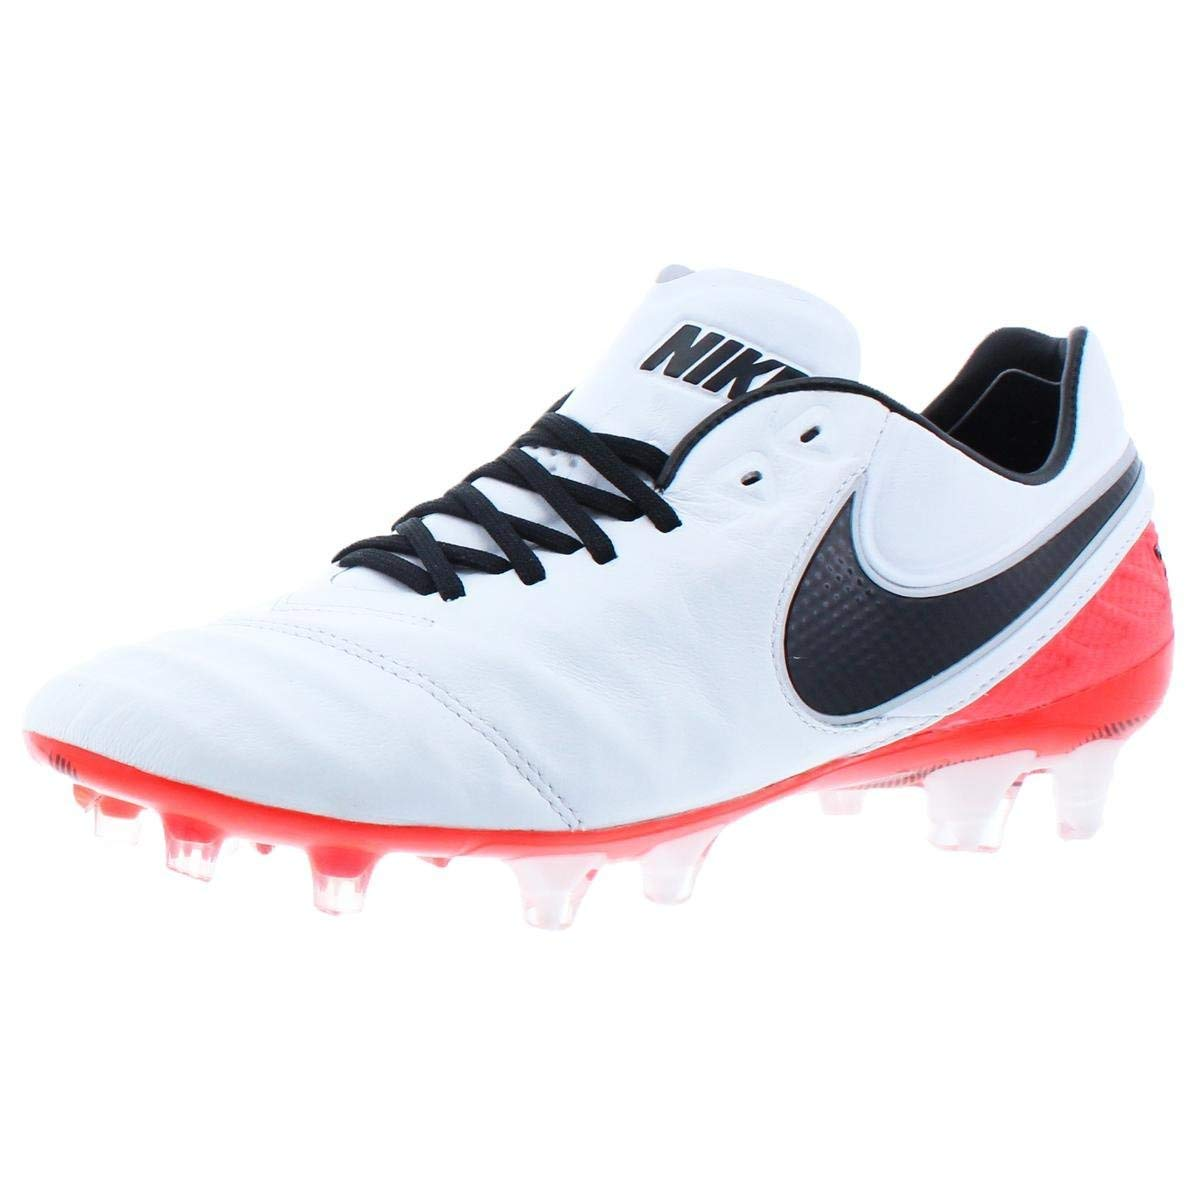 445606b91 Nike Women s Tiempo Legend VI FG Soccer Cleat (Sz. 7.5) White ...